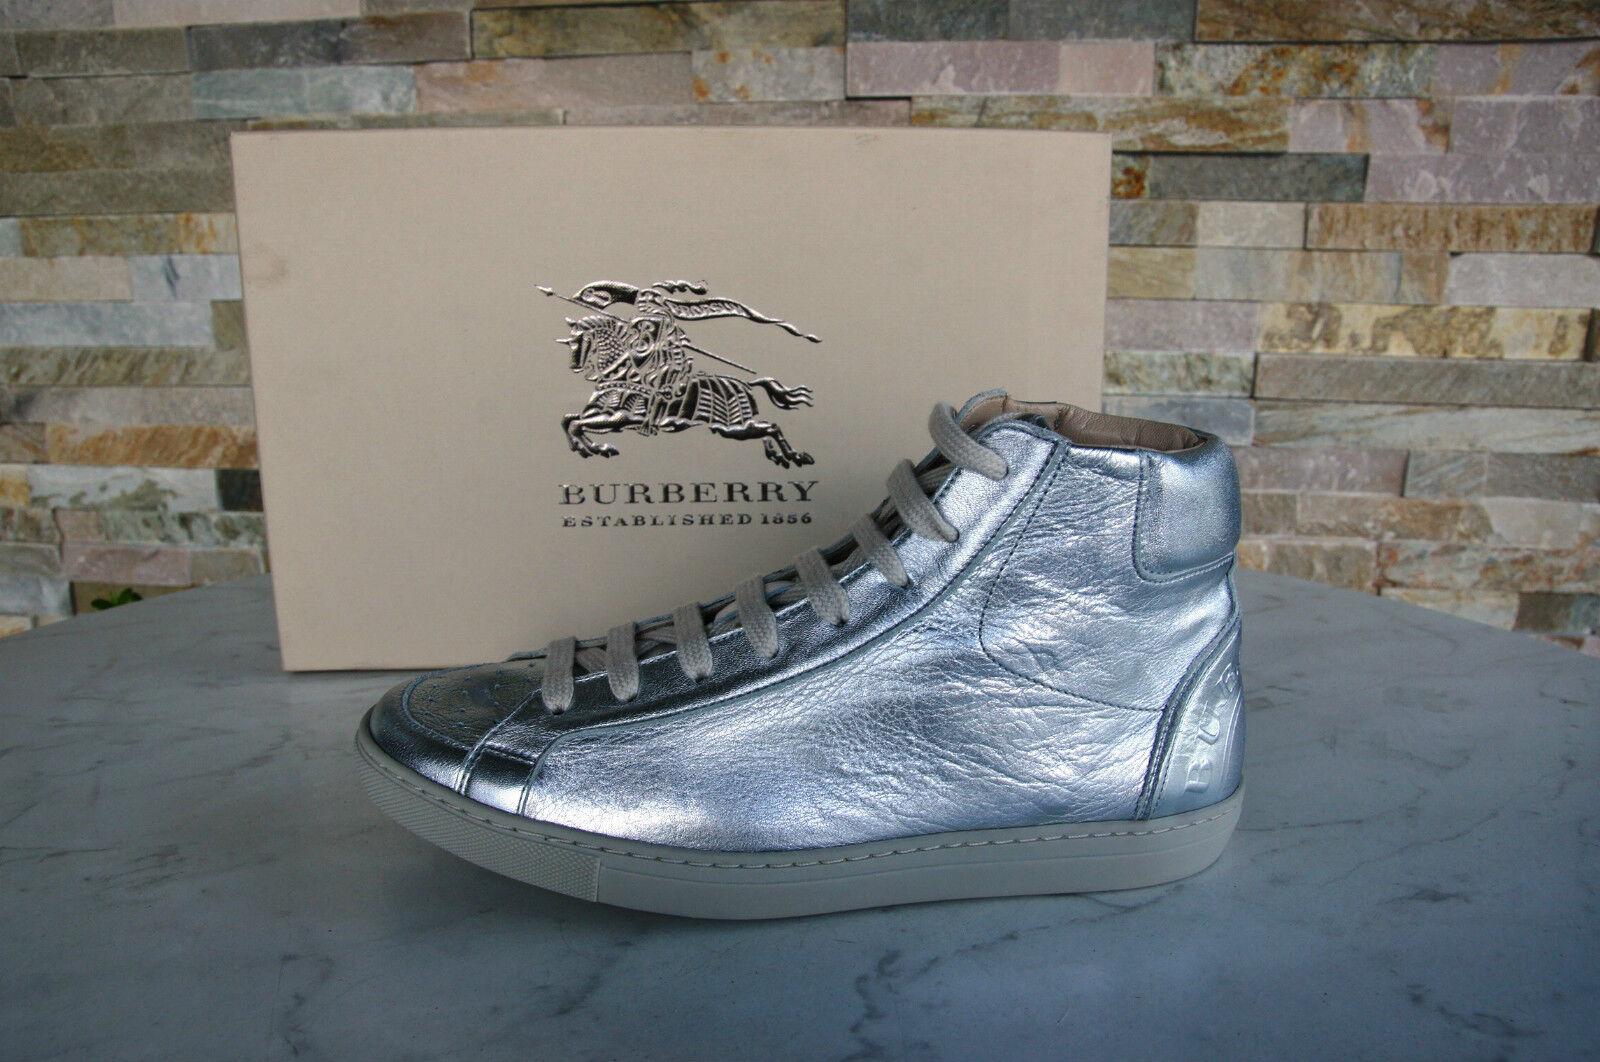 ORIG BURBERRY TAGLIA 39 High-Top Scarpe da Ginnastica normalissime scarpe UVP argento NUOVO UVP scarpe 1d6a63